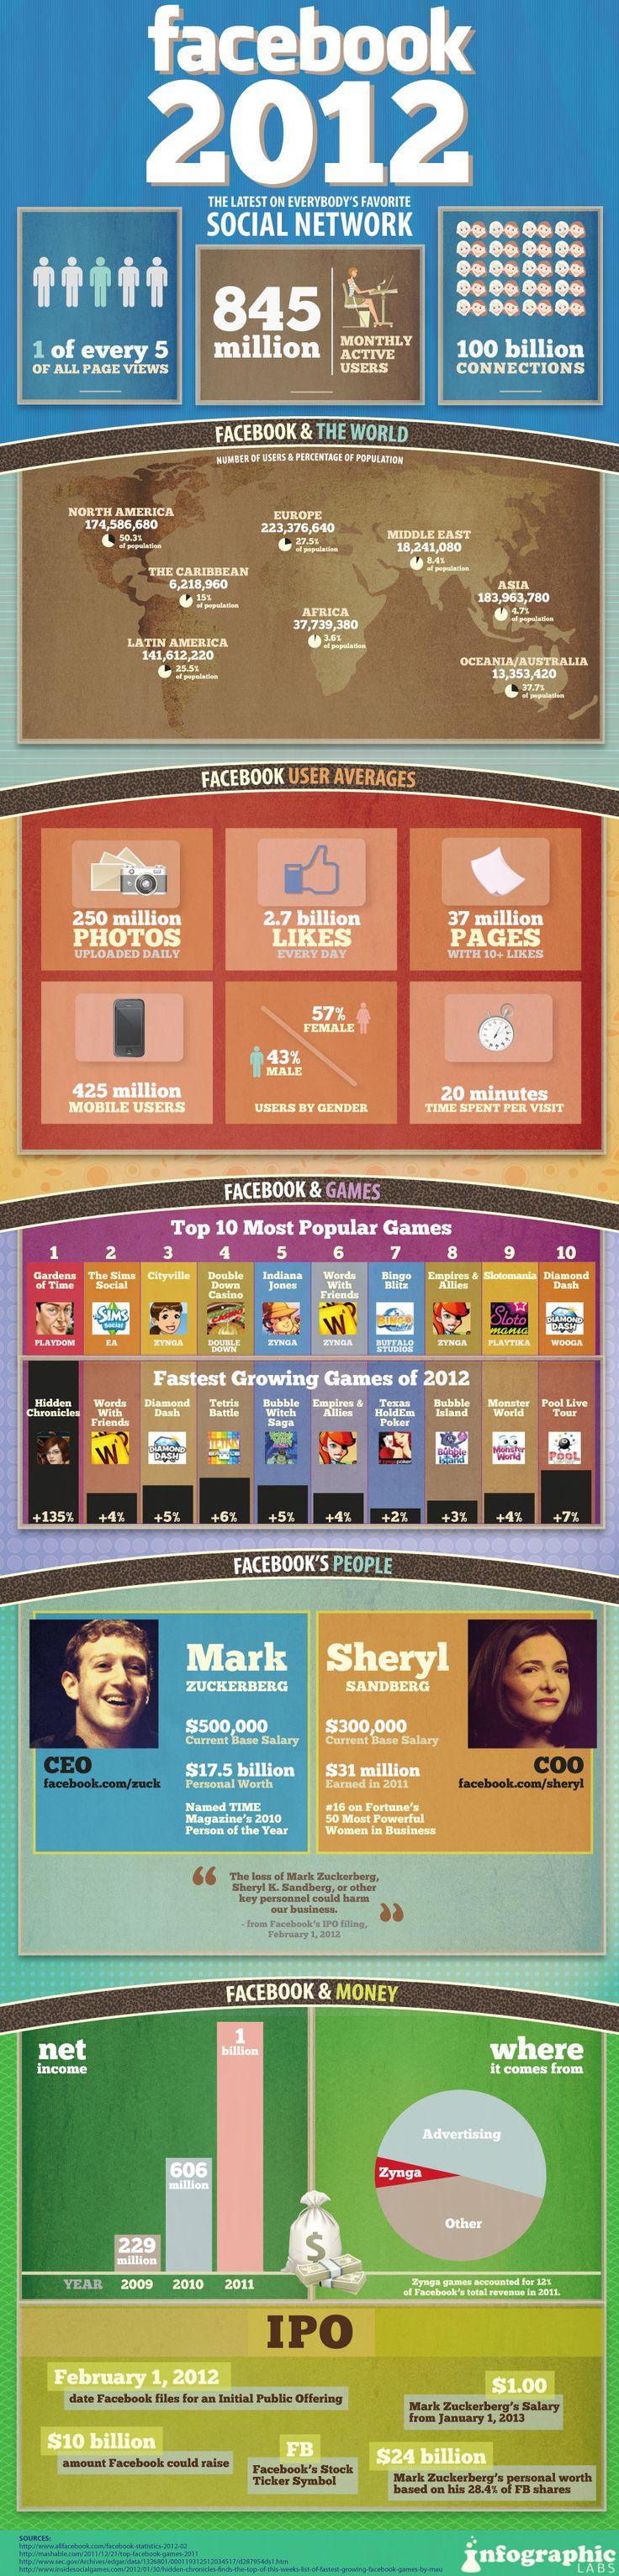 10 Interesting Facebook Infogr